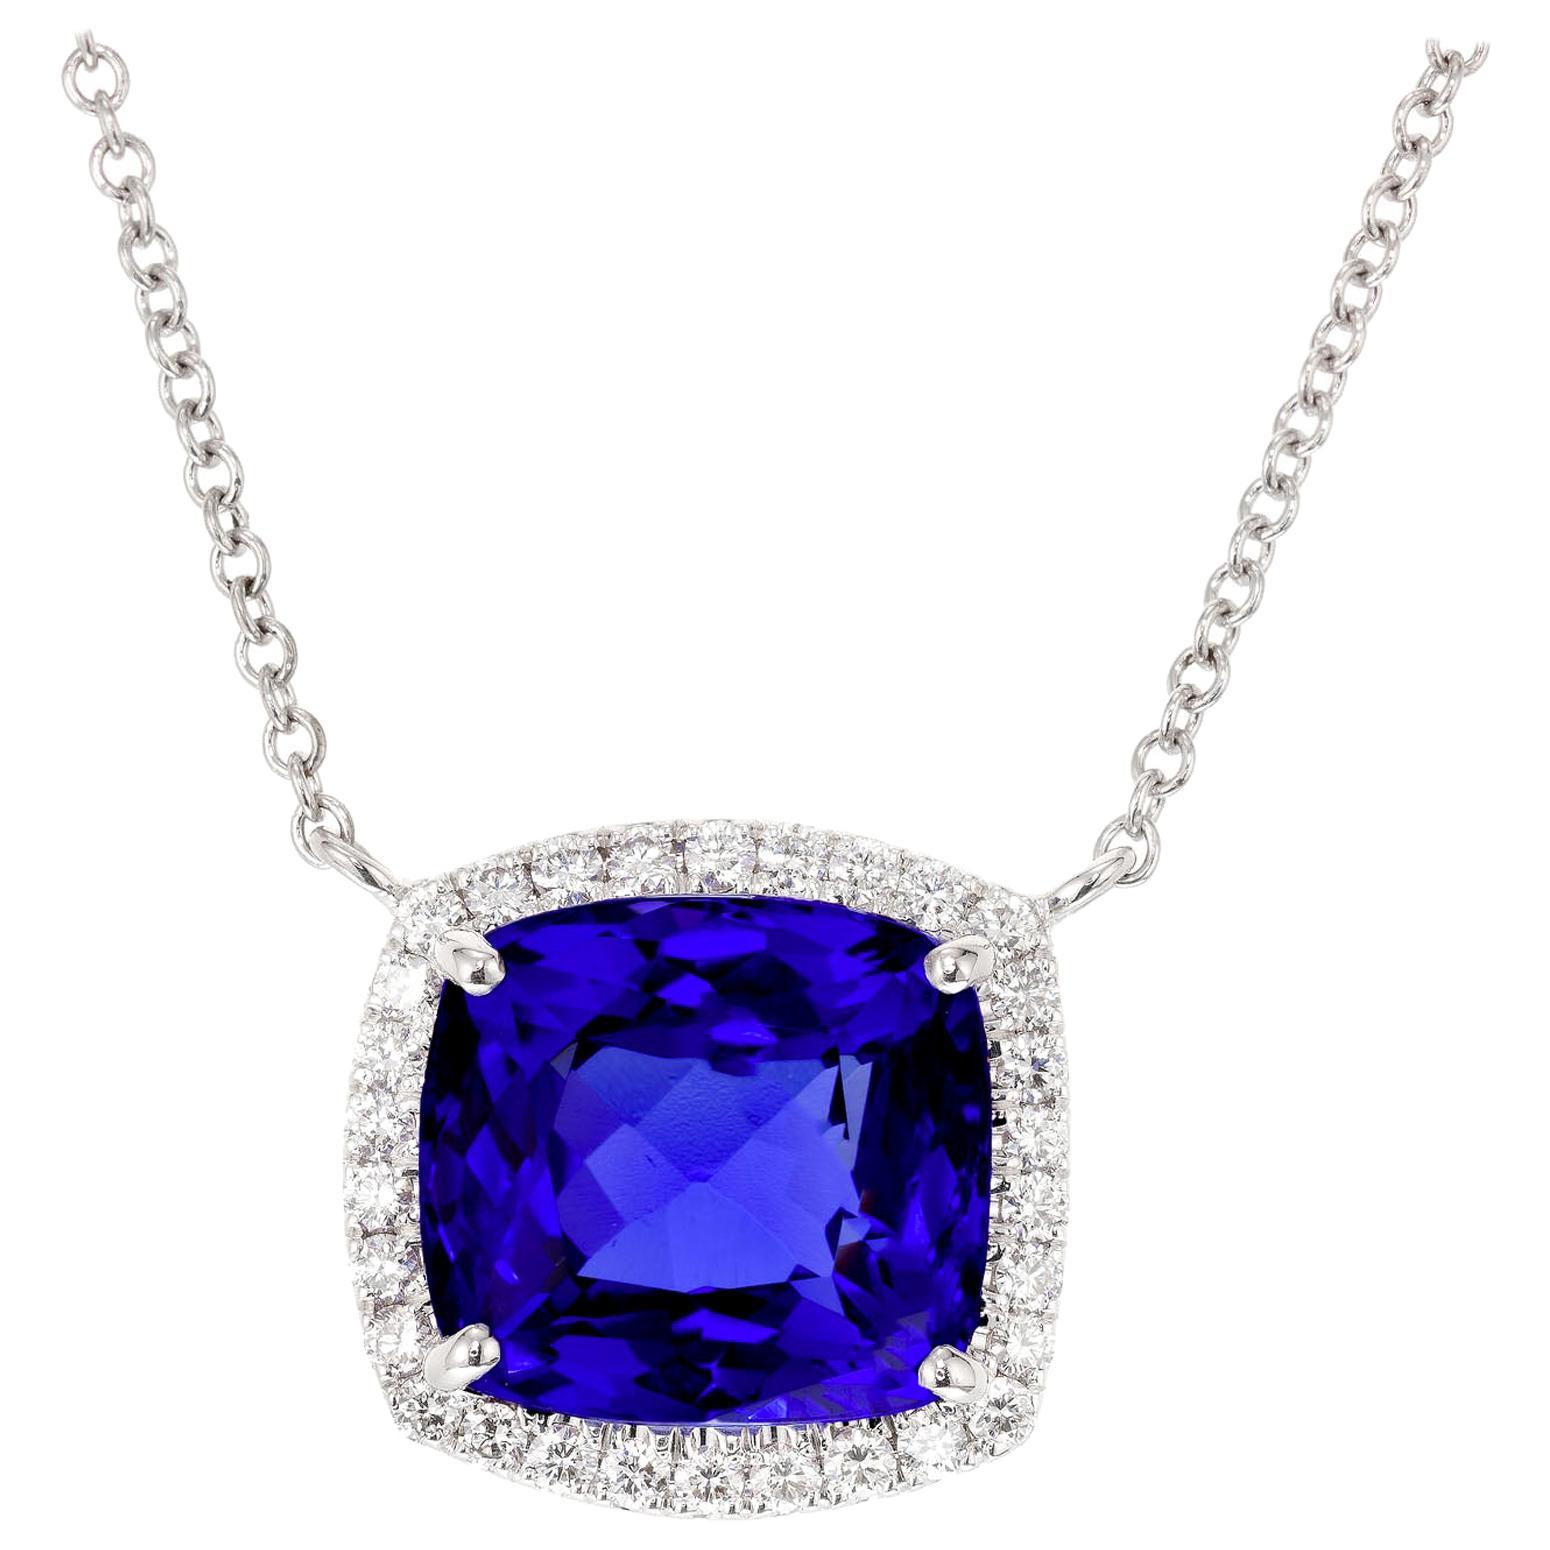 Peter Suchy 6.18 Carat Blue Tanzanite Diamond Halo White Gold Pendant Necklace